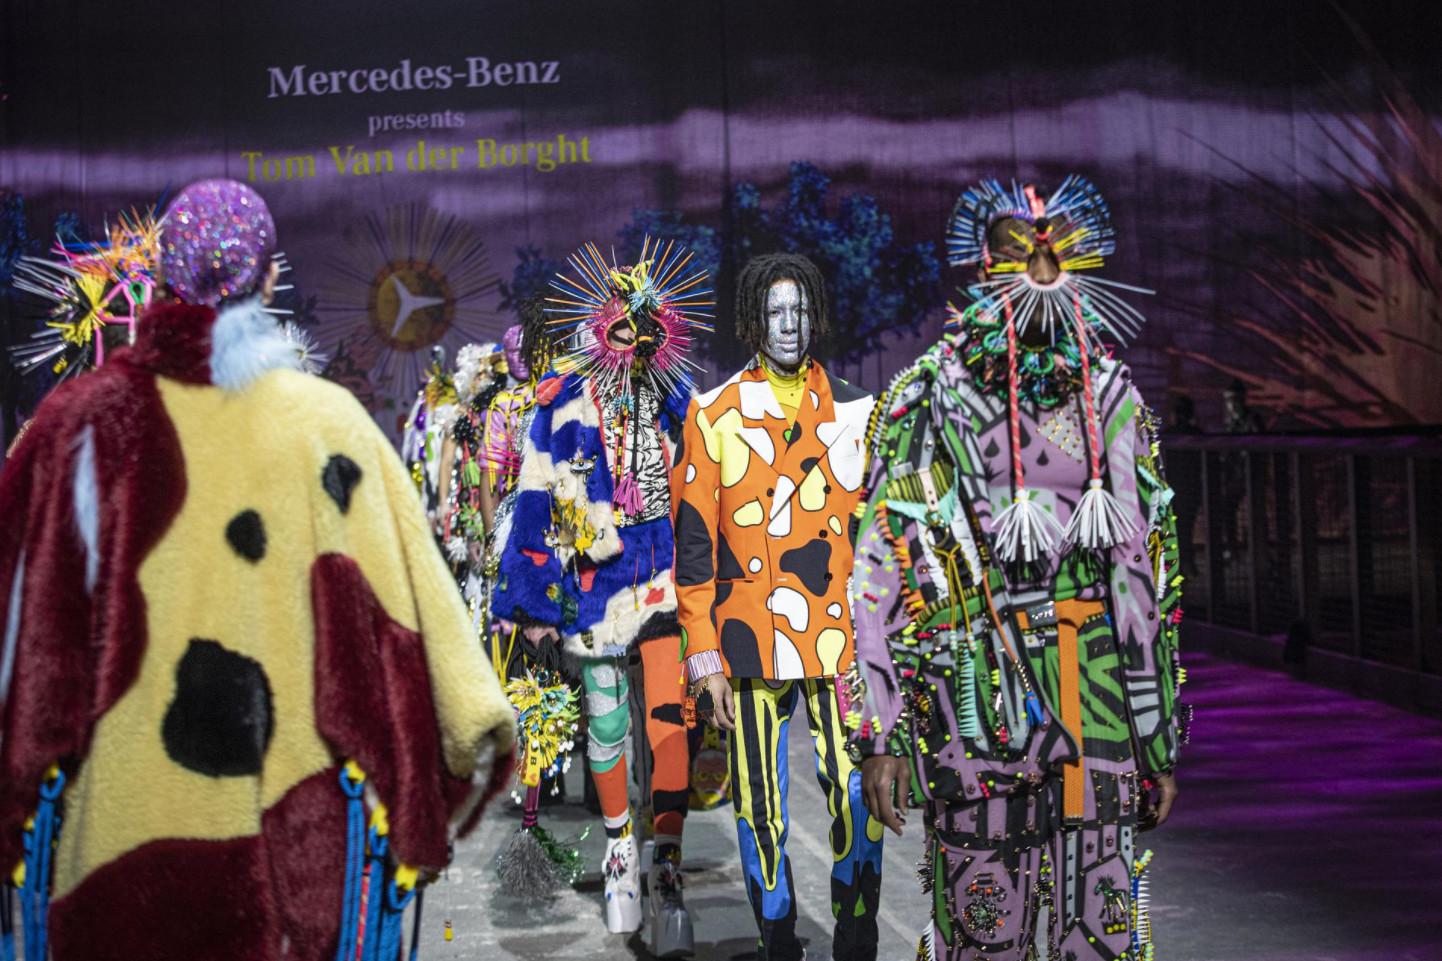 Tom van der borght mercedes benz fashion berlin (1)